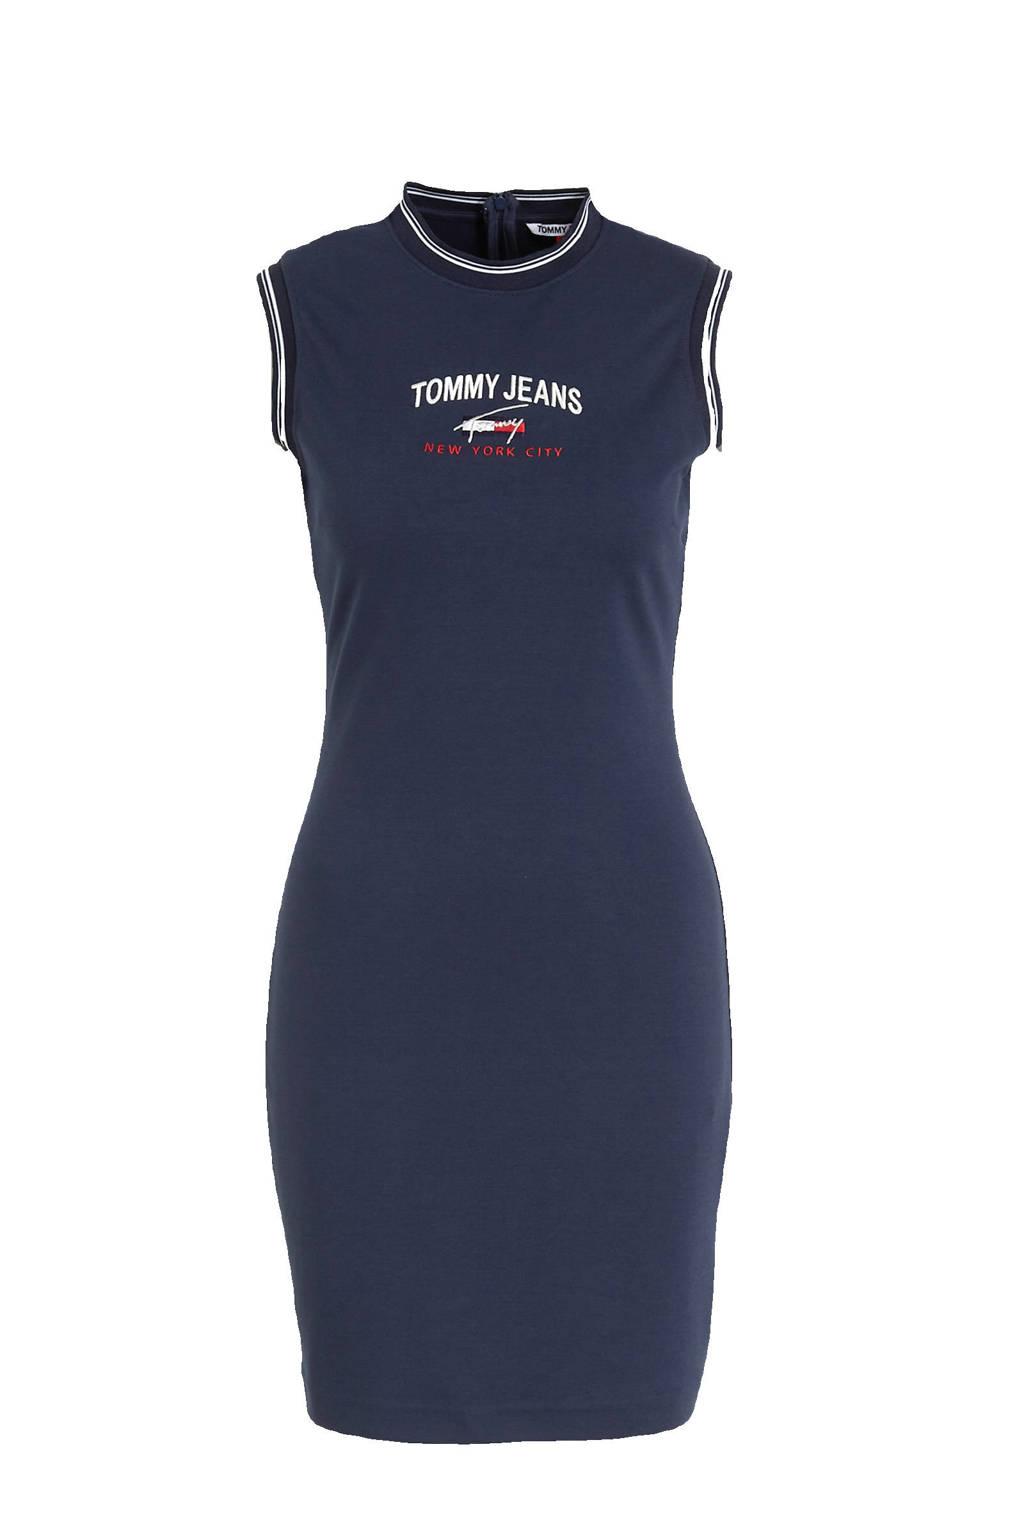 Tommy Jeans jurk met logo marine, Marine